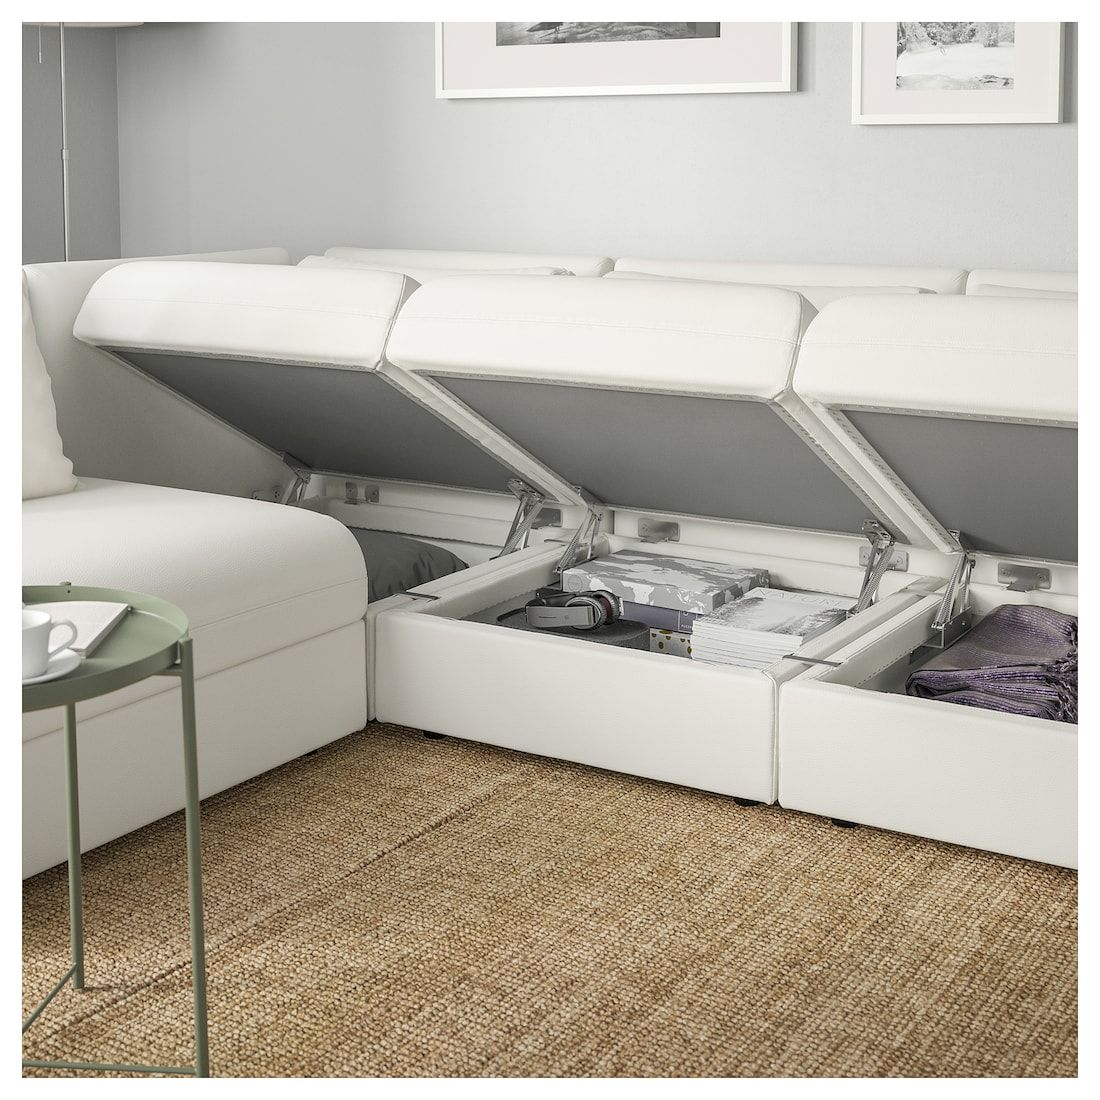 Vallentuna Modular Corner Sofa 3 Seat With Storage Murum White Modular Corner Sofa Corner Sofa Sofa Storage